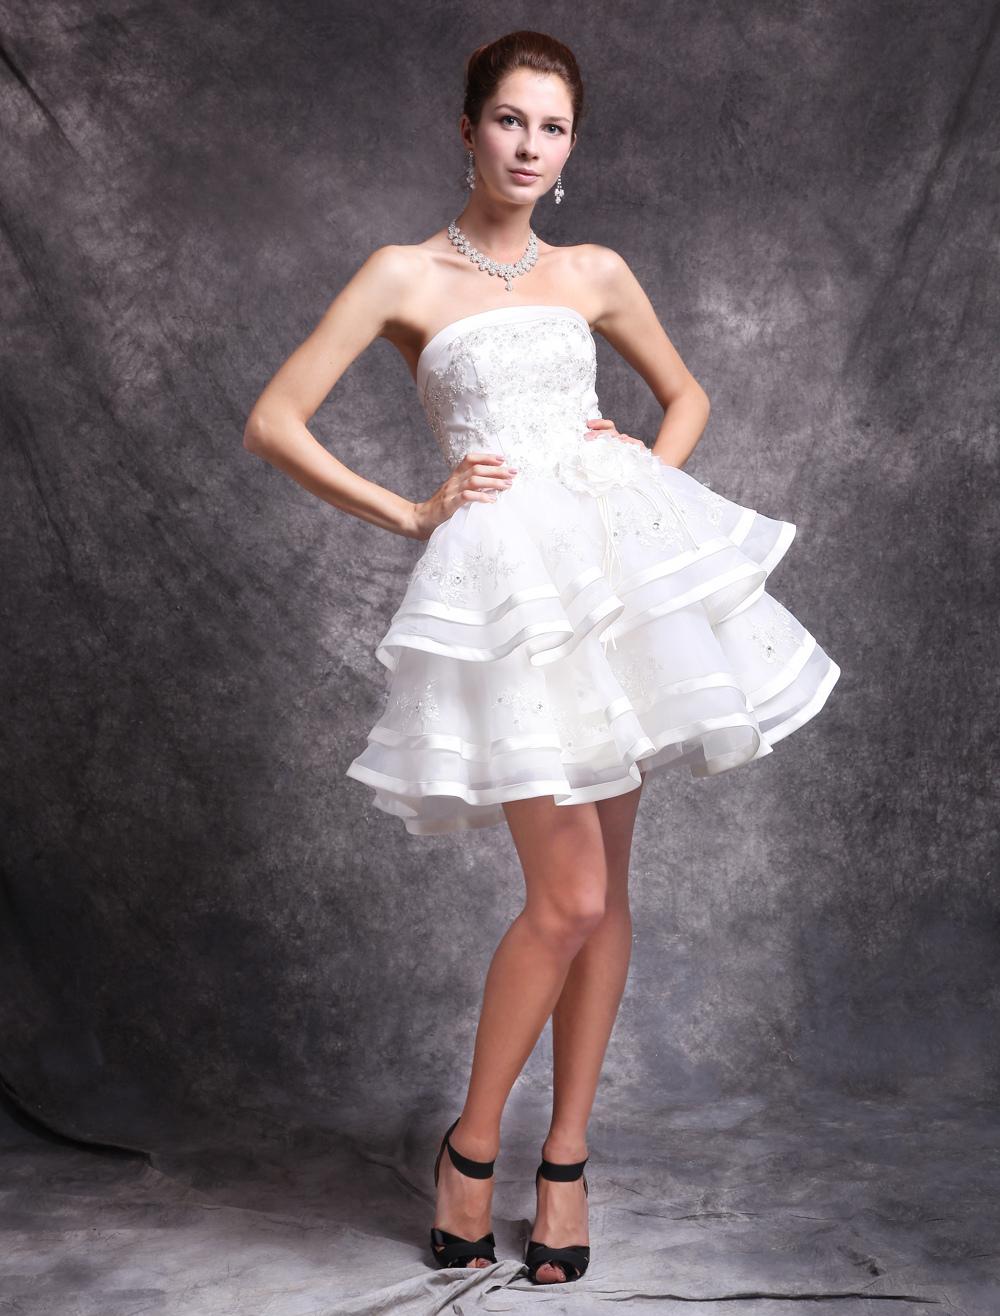 Ivory Tiered Knee Length Satin Bridal Short Wedding Dress (Cheap Wedding Dress) photo